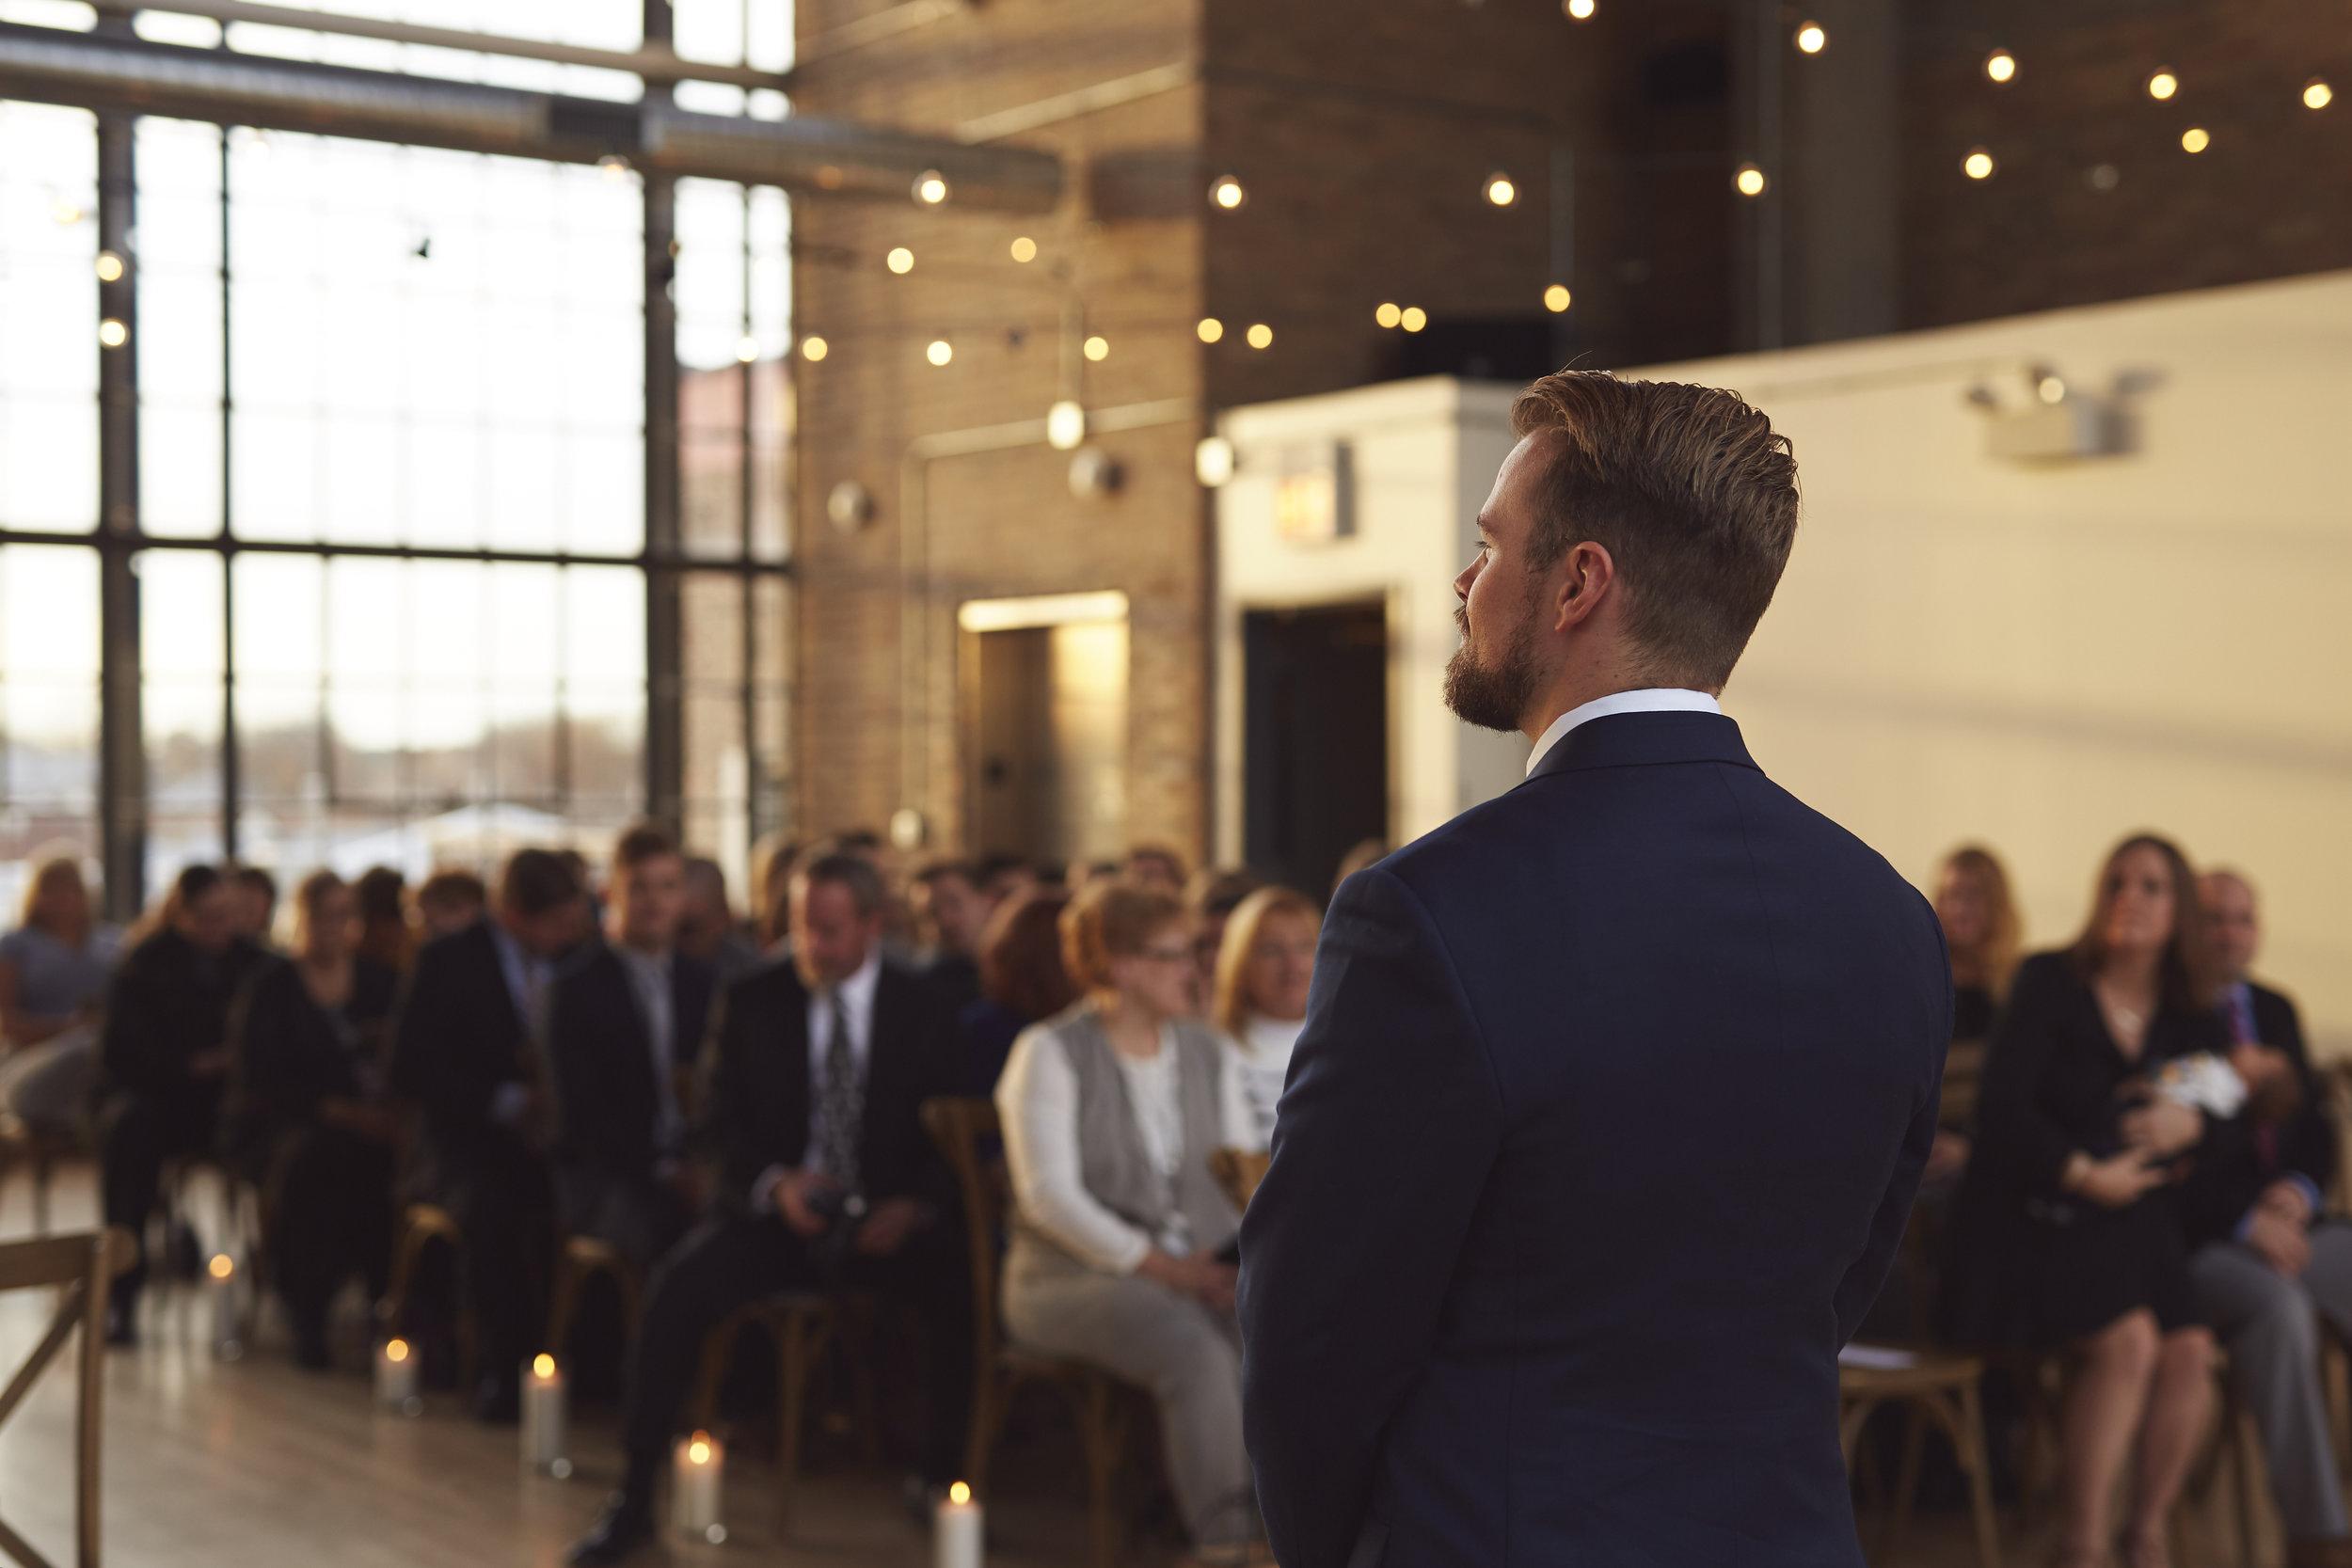 Jen & Ben Wedding - benromangphoto - 6I5A3449.jpg